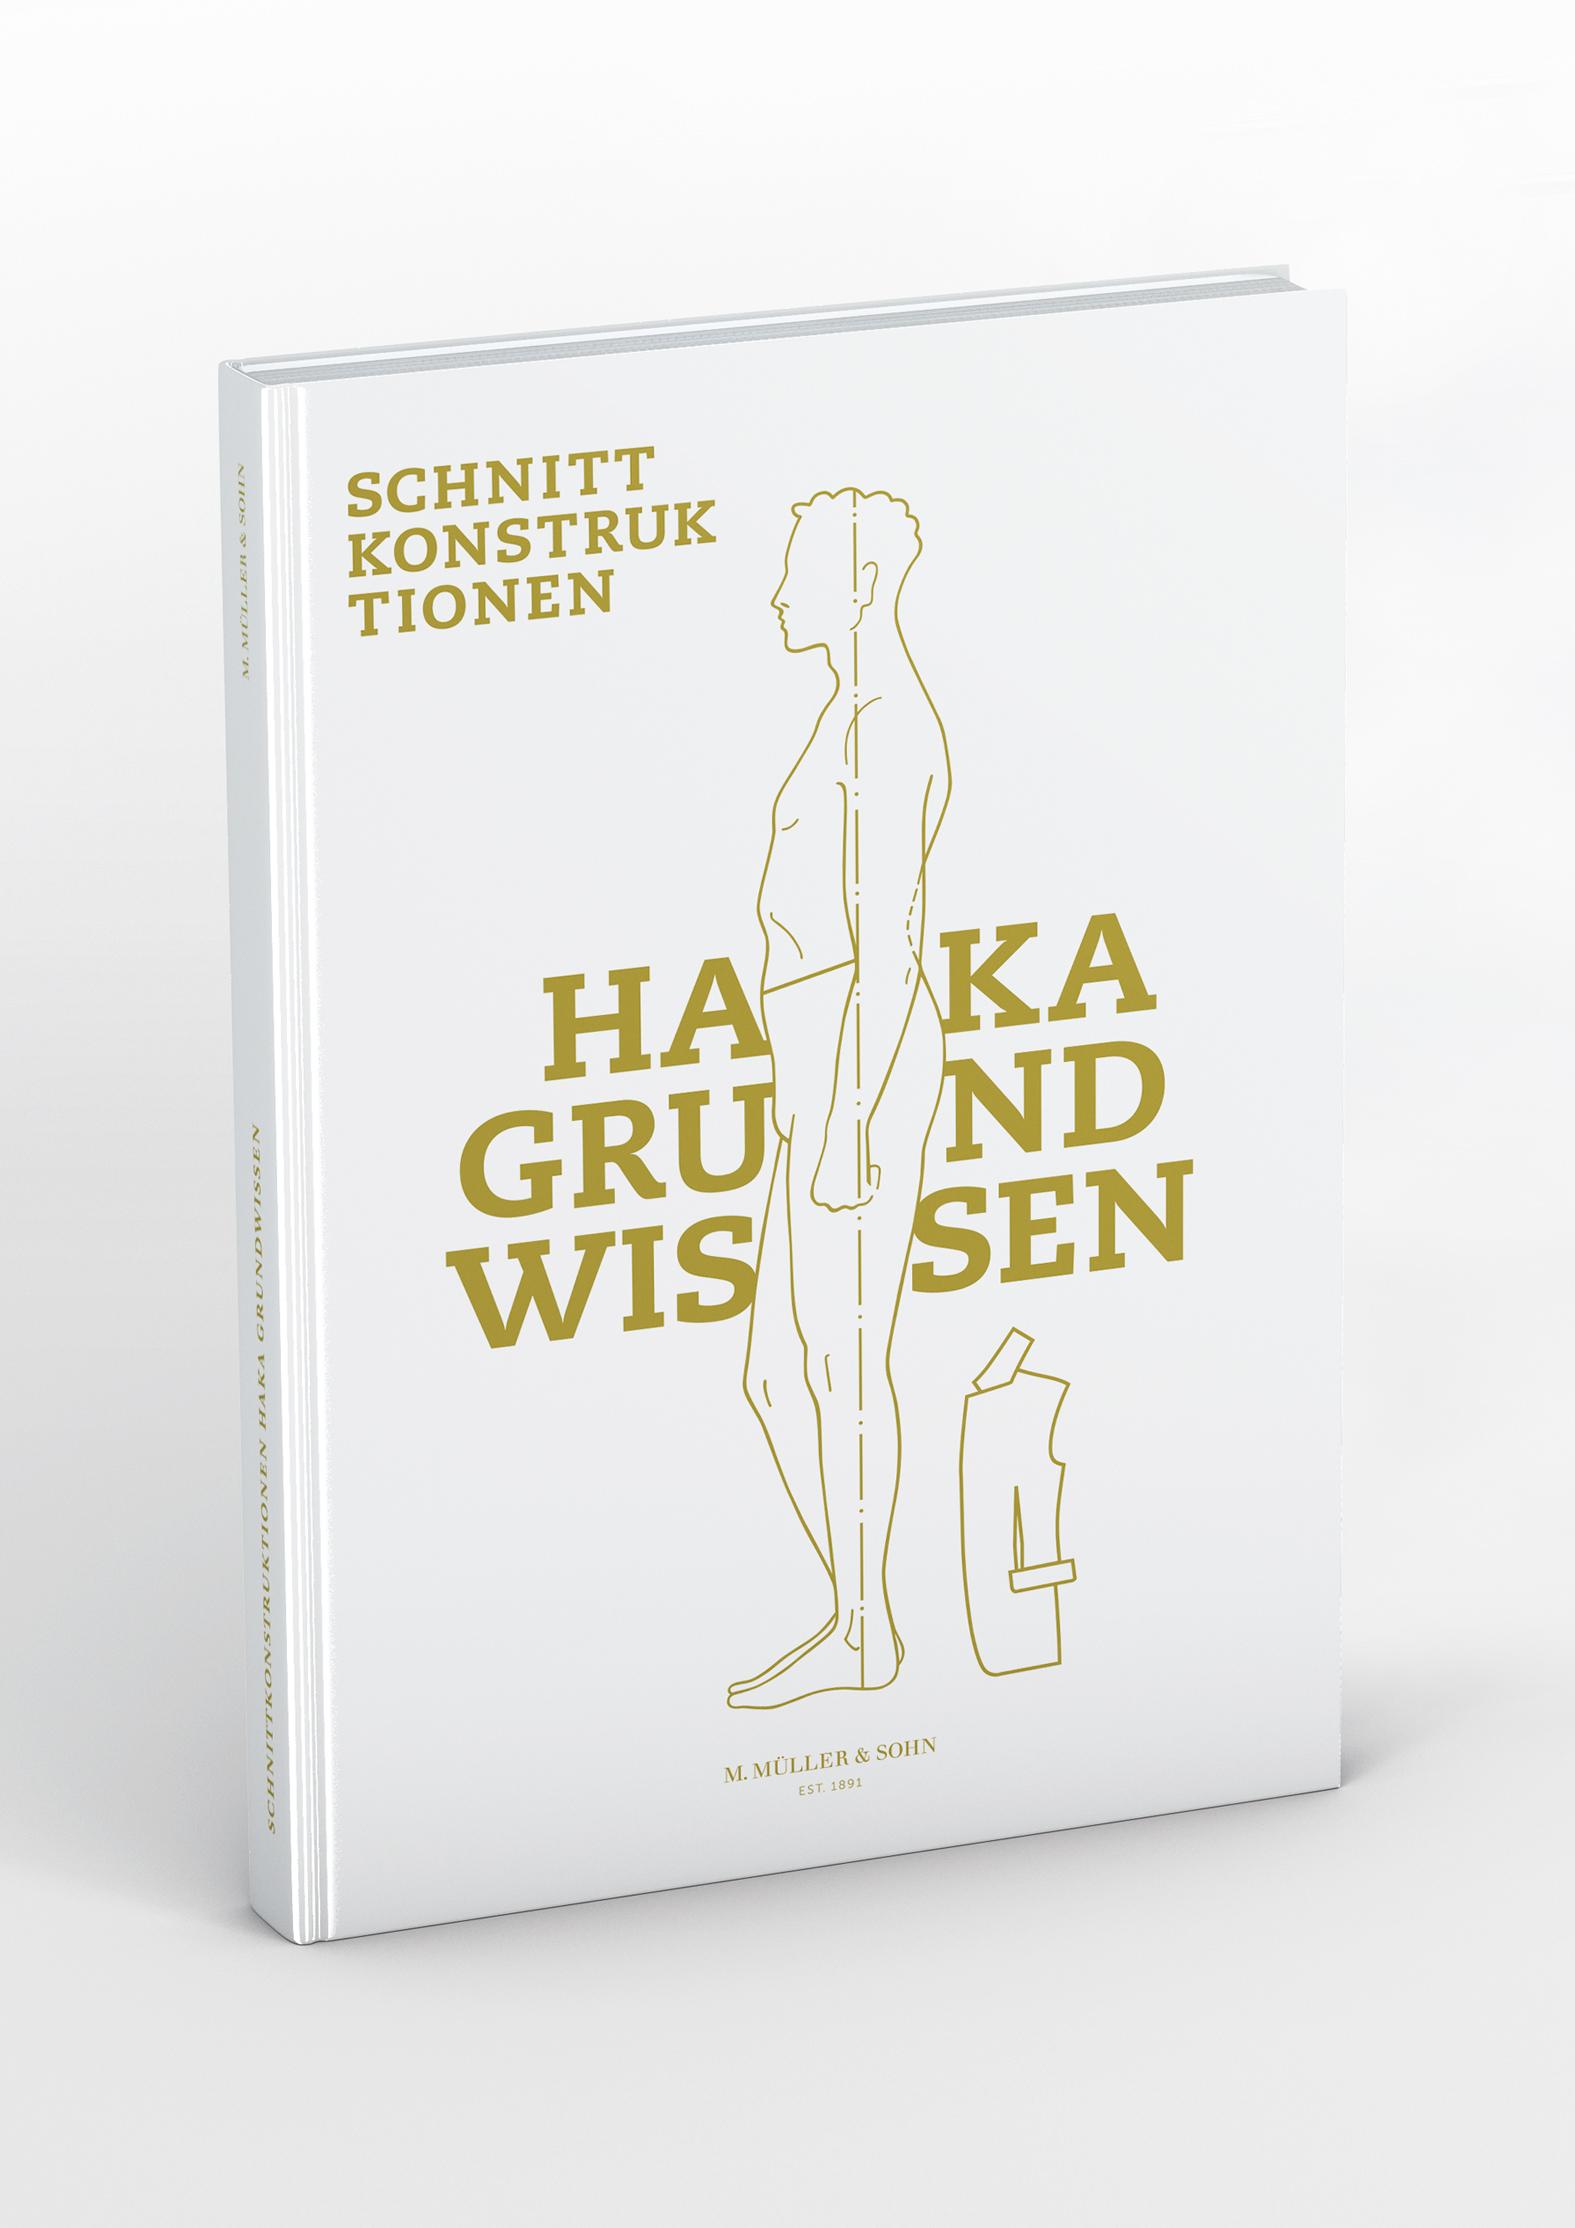 Produkt: HAKA Schnitt-konstruktionen Grundwissen